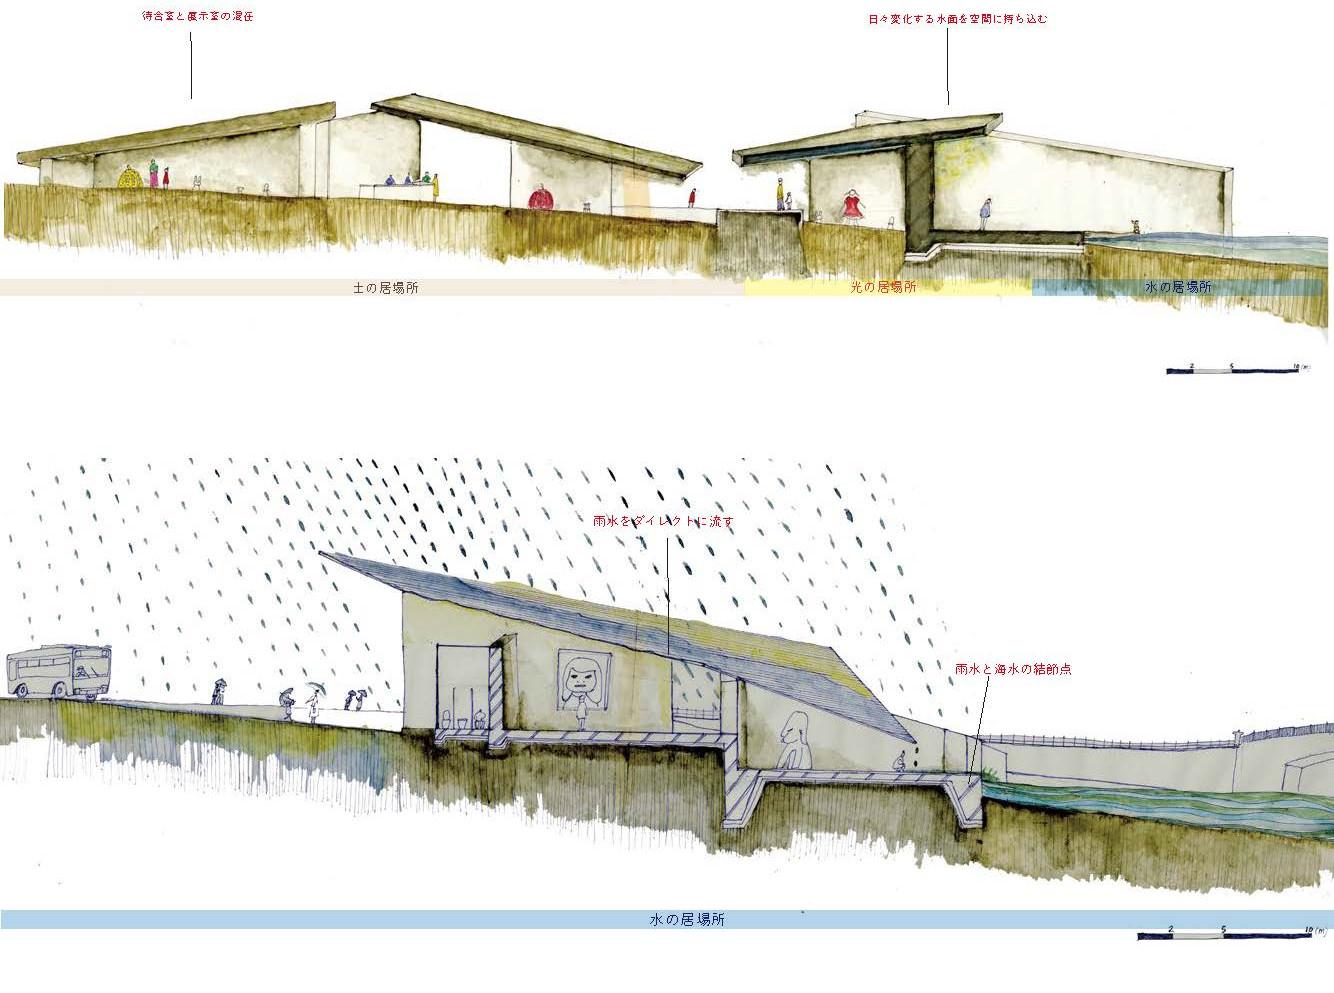 建築展WEB水辺_ページ_12.jpg